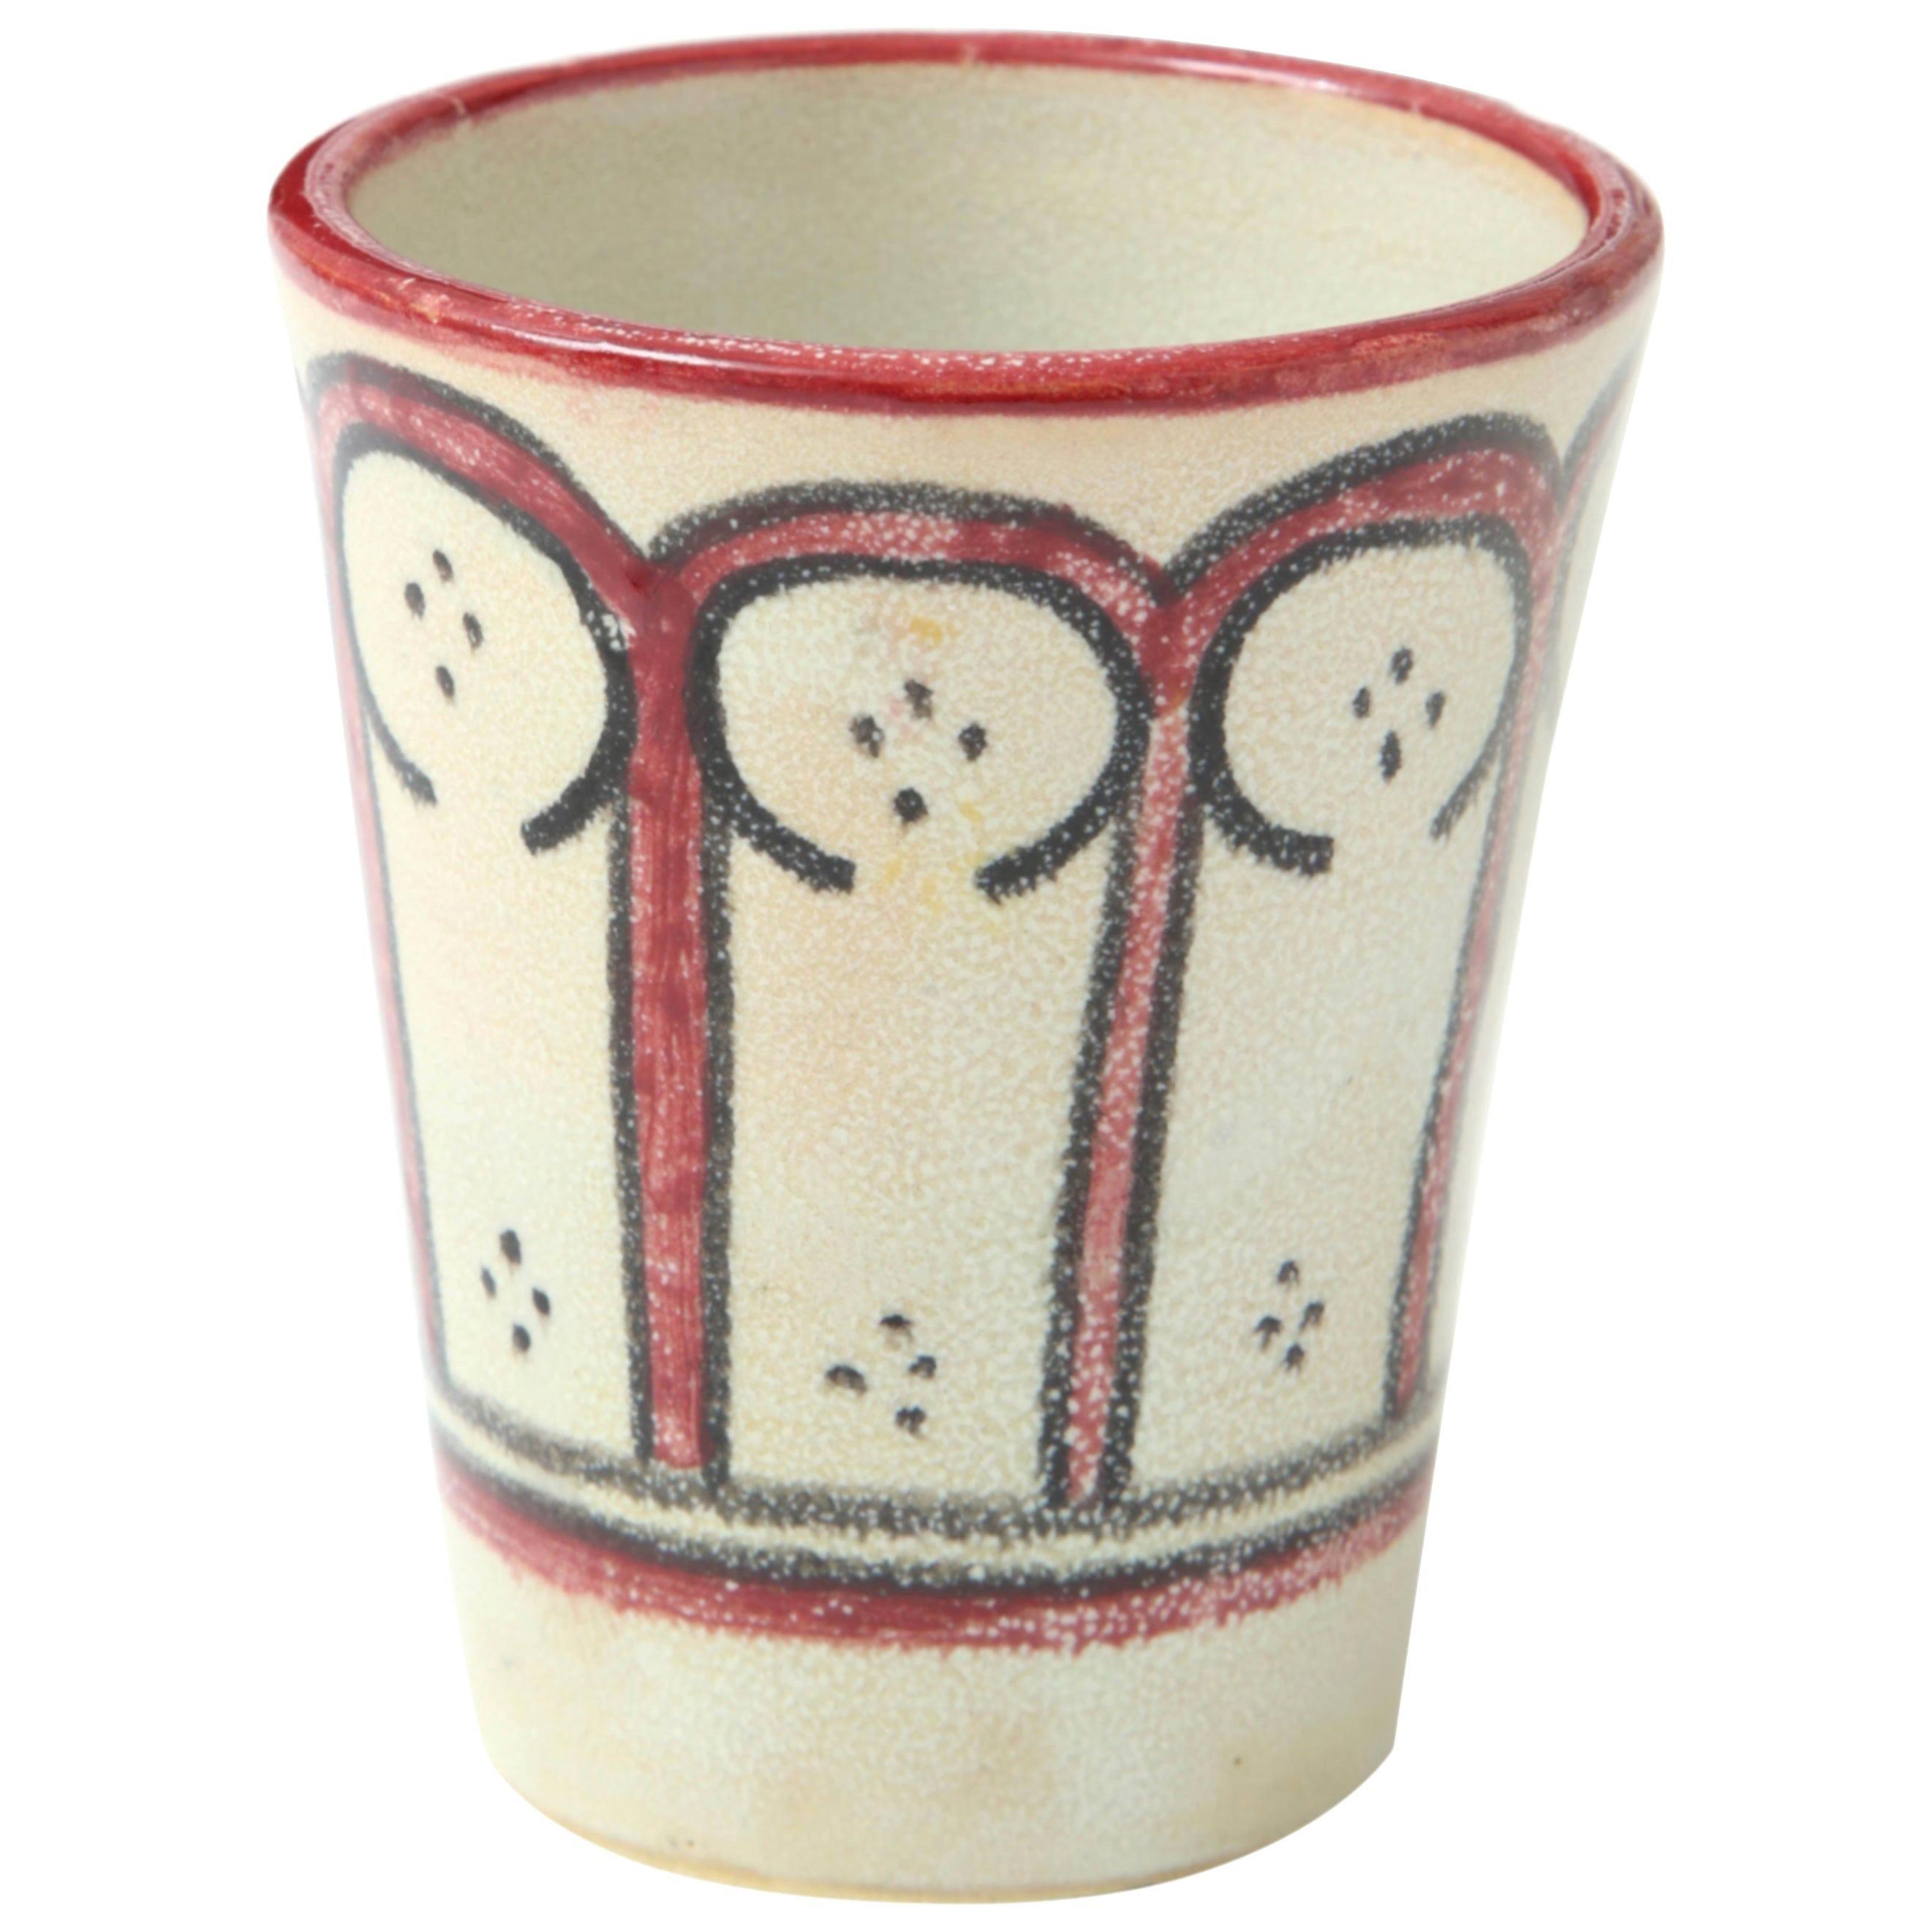 Ceramic Vessel, Red, Black and Cream, Handcrafted, Morocco, Contemporary